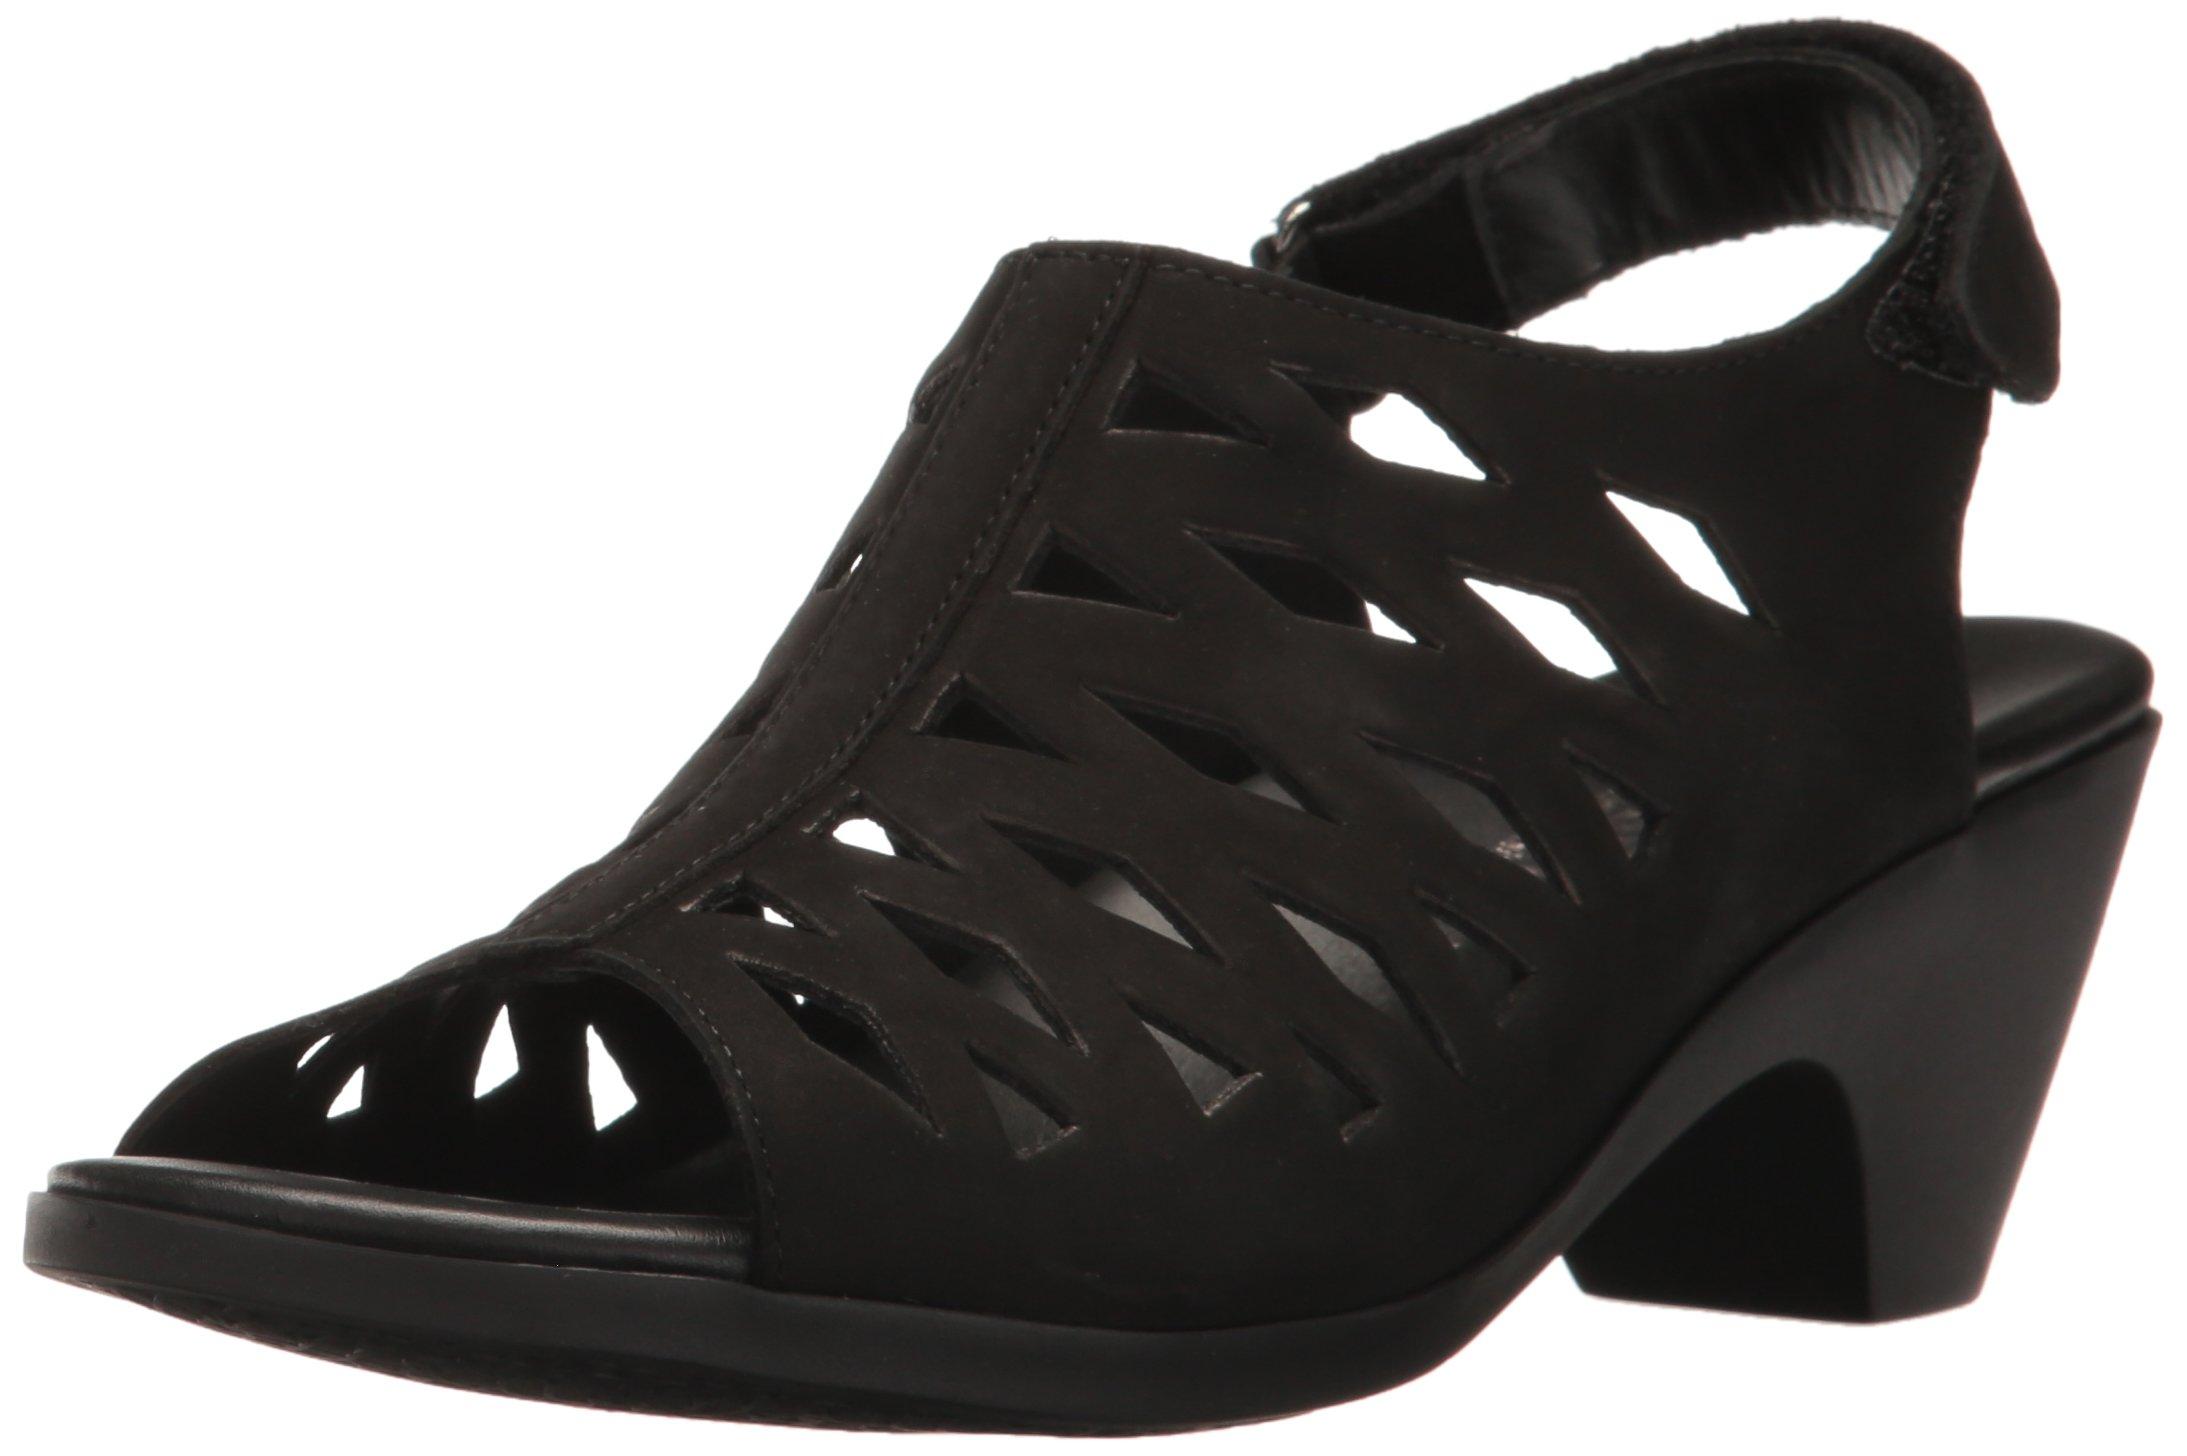 Mephisto Women's Candice Dress Sandal, Black Bucksoft, 7 M US